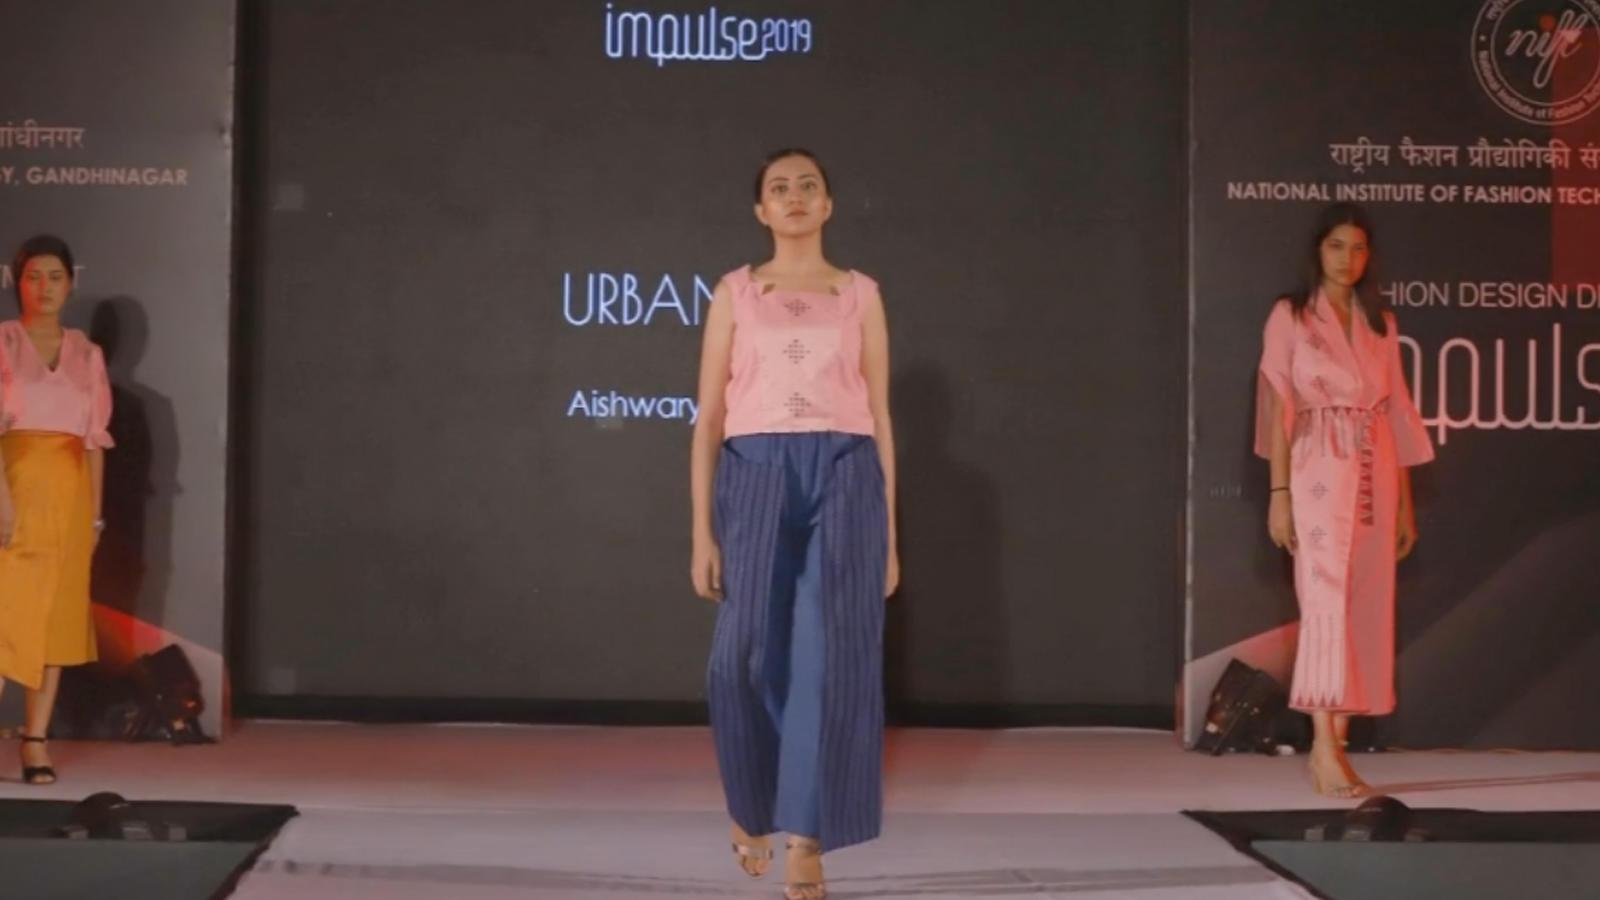 A Fashion Show At Nift Gandhinagar Entertainment Times Of India Videos